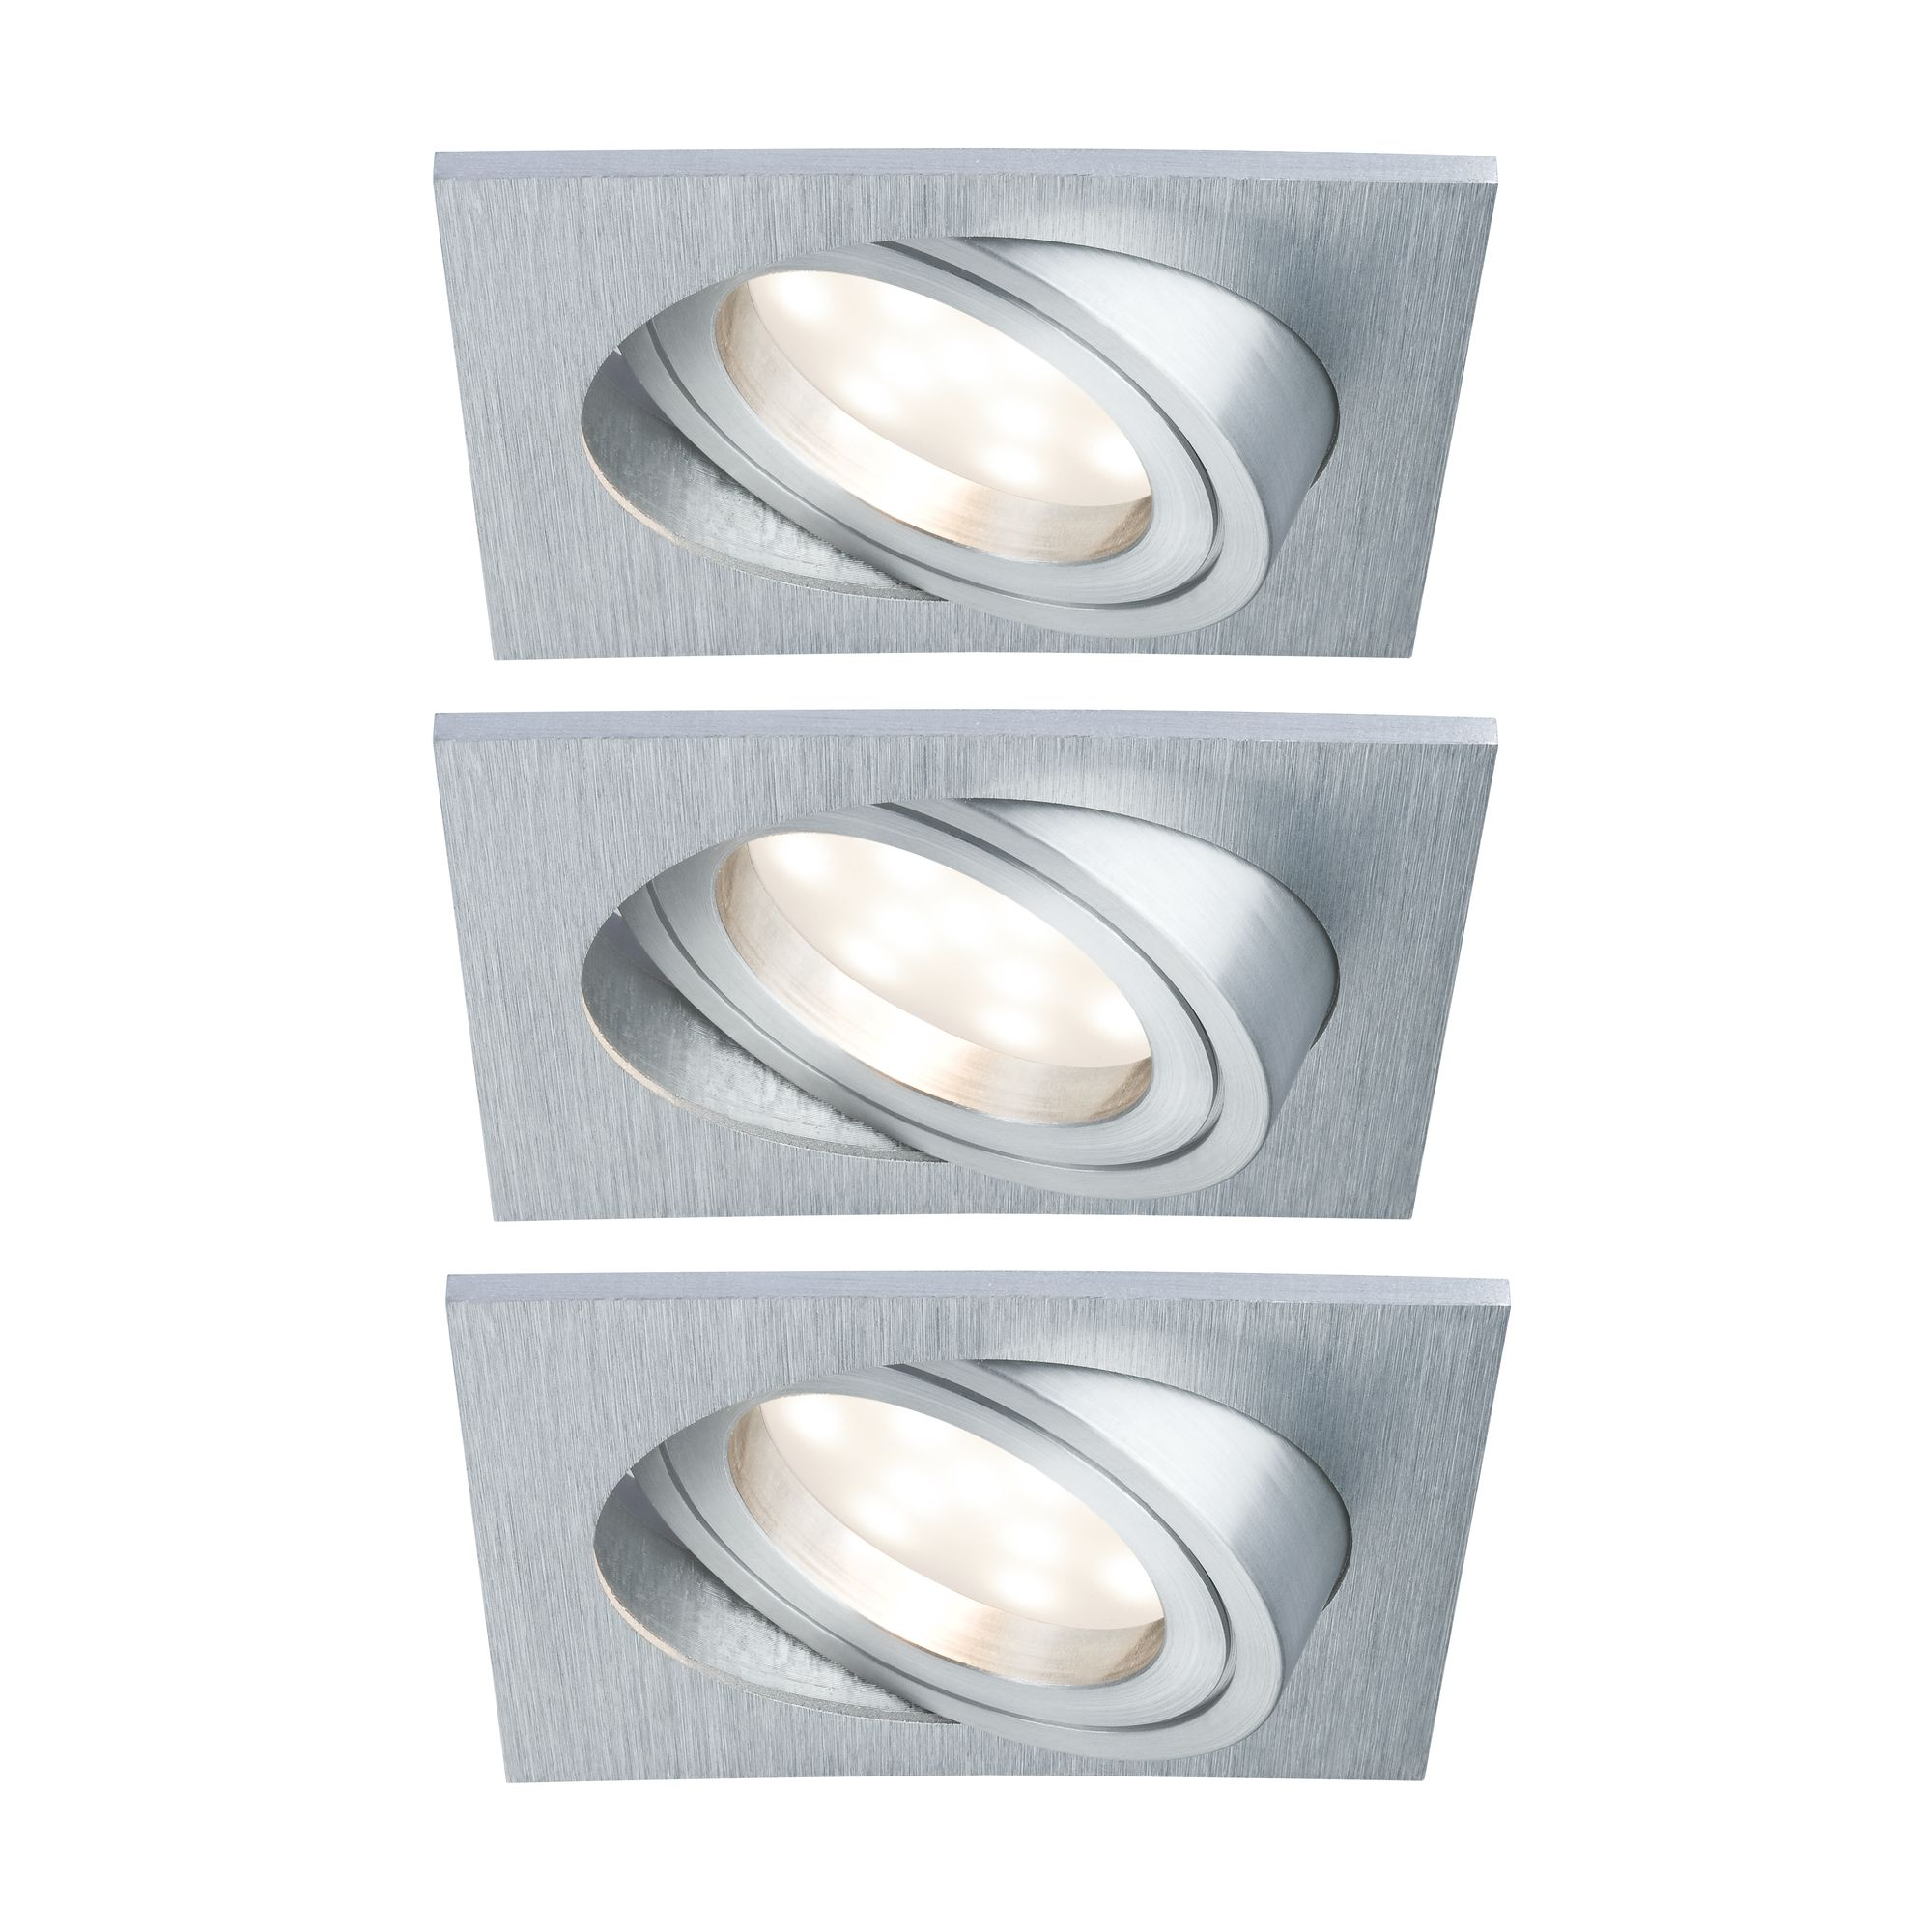 Paulmann,LED Einbaustrahler 3er-Set Coin schwenkbar und dimmbar satiniert eckig 7W Alu